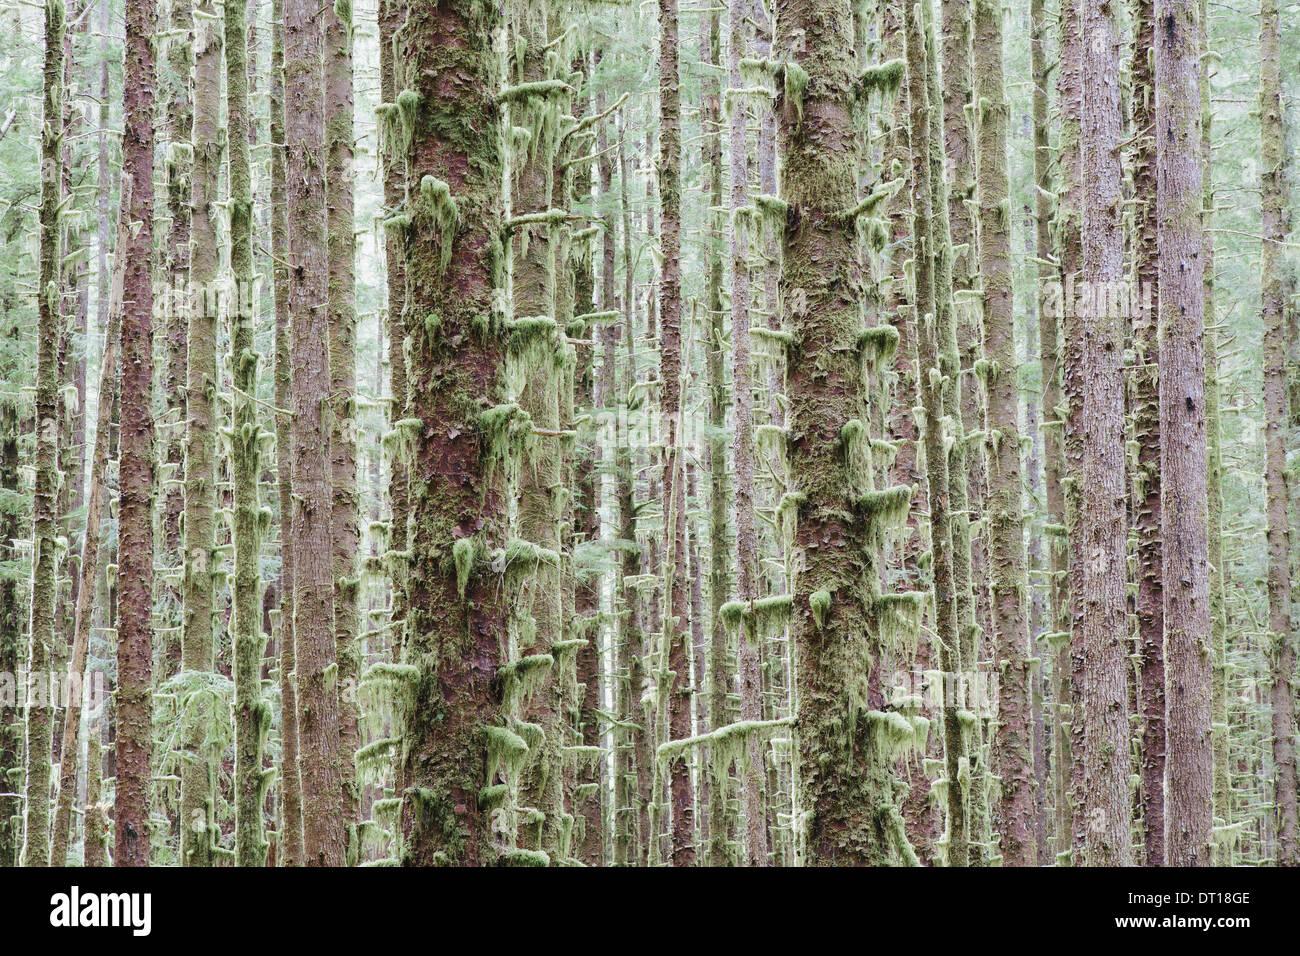 Olympic National Park Washington USA. Sitka Spruce and Western Hemlock trees rainforest - Stock Image